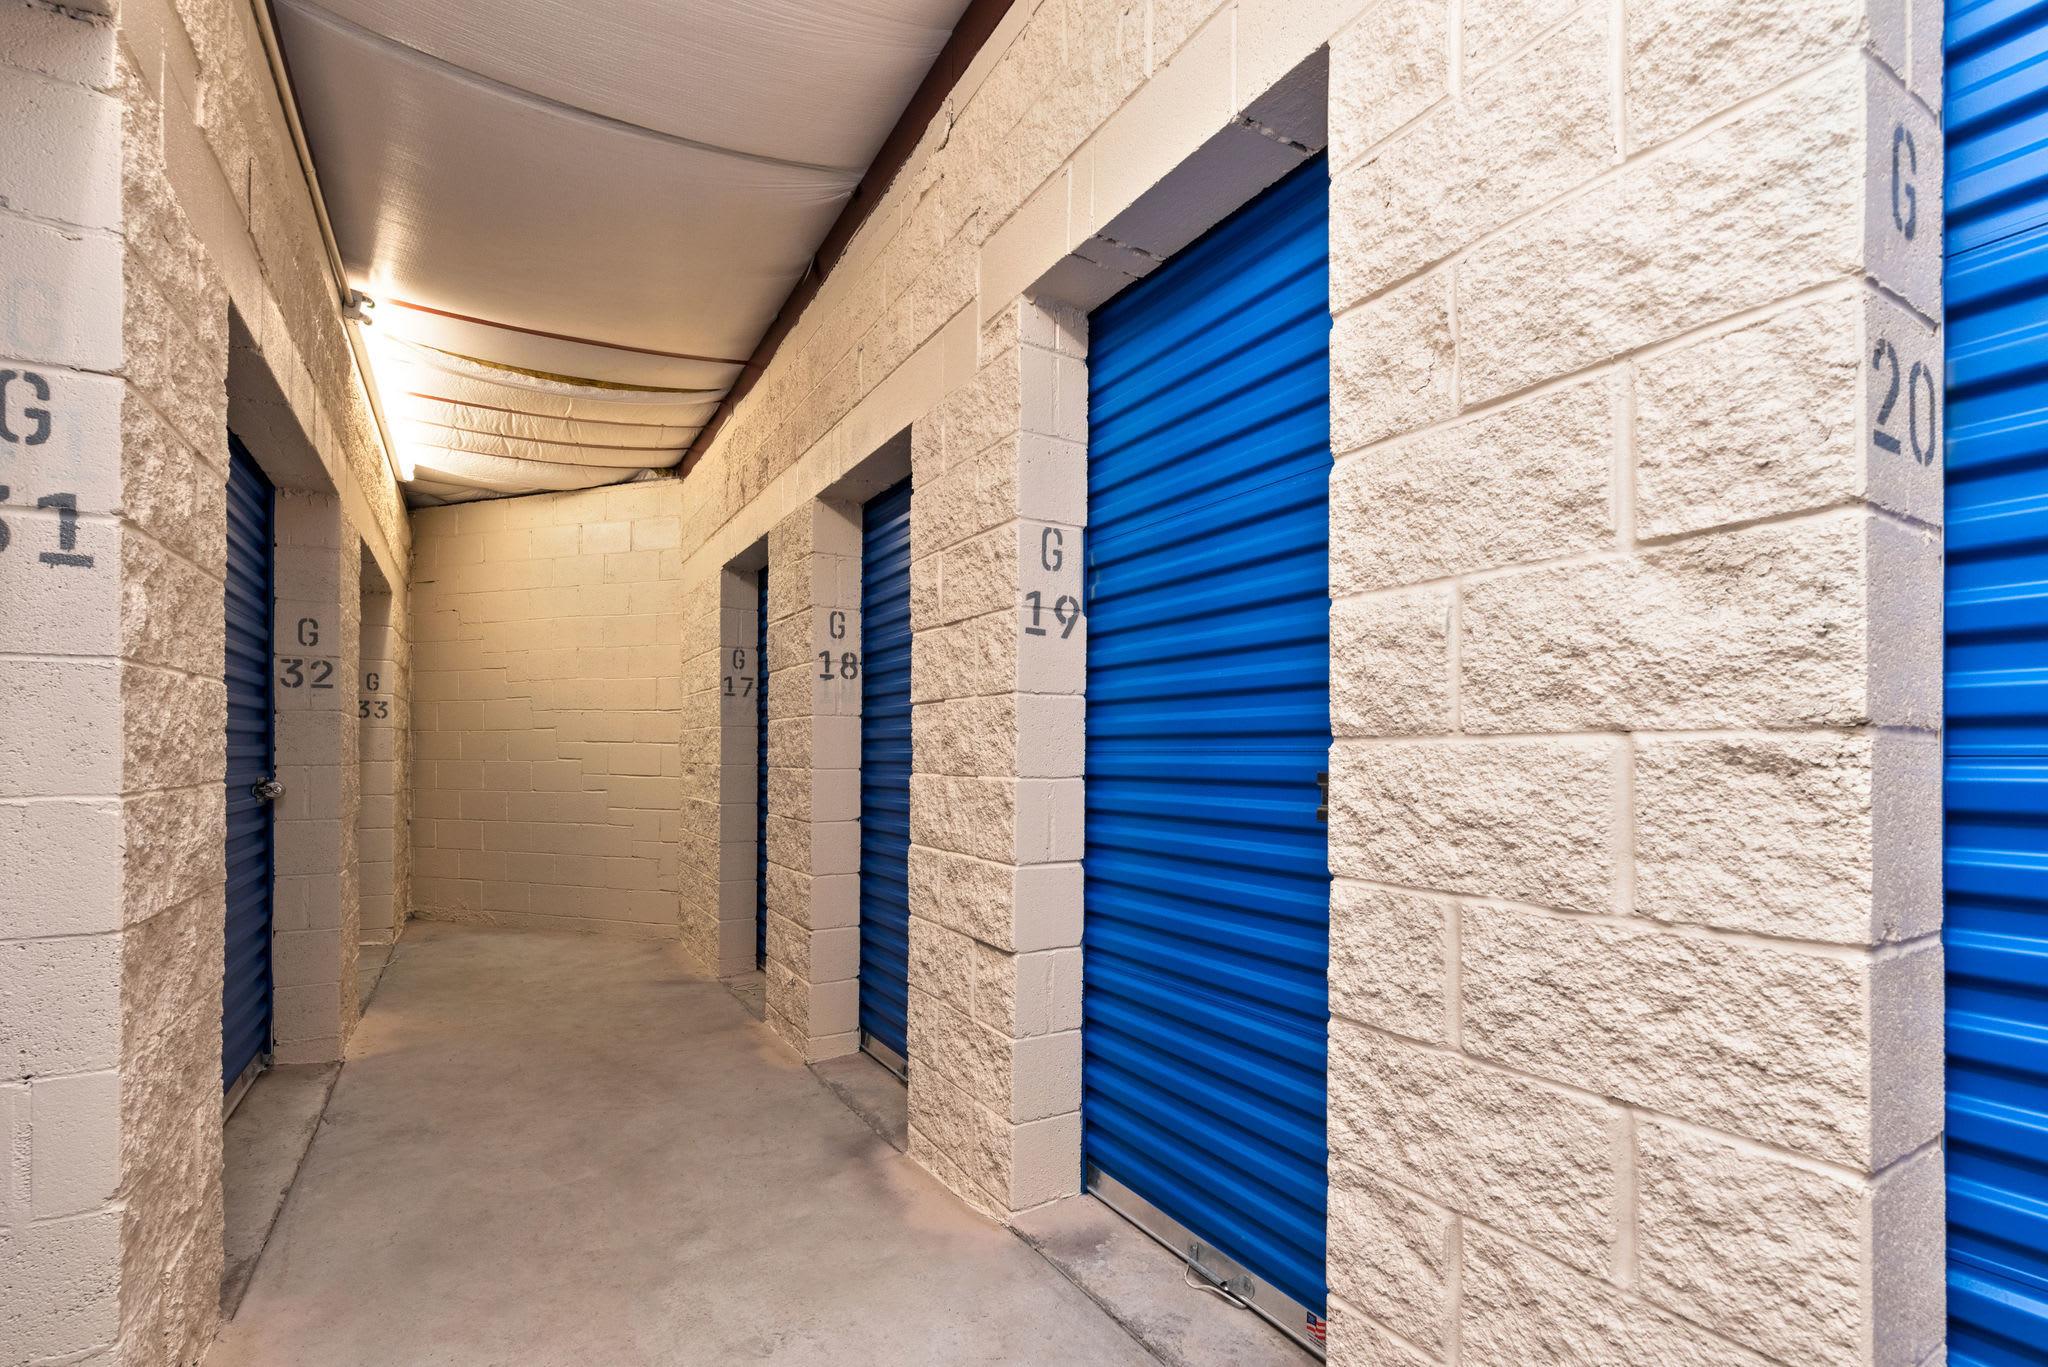 Storage units hallways closed at Stor'em Self Storage in Lehi, Utah